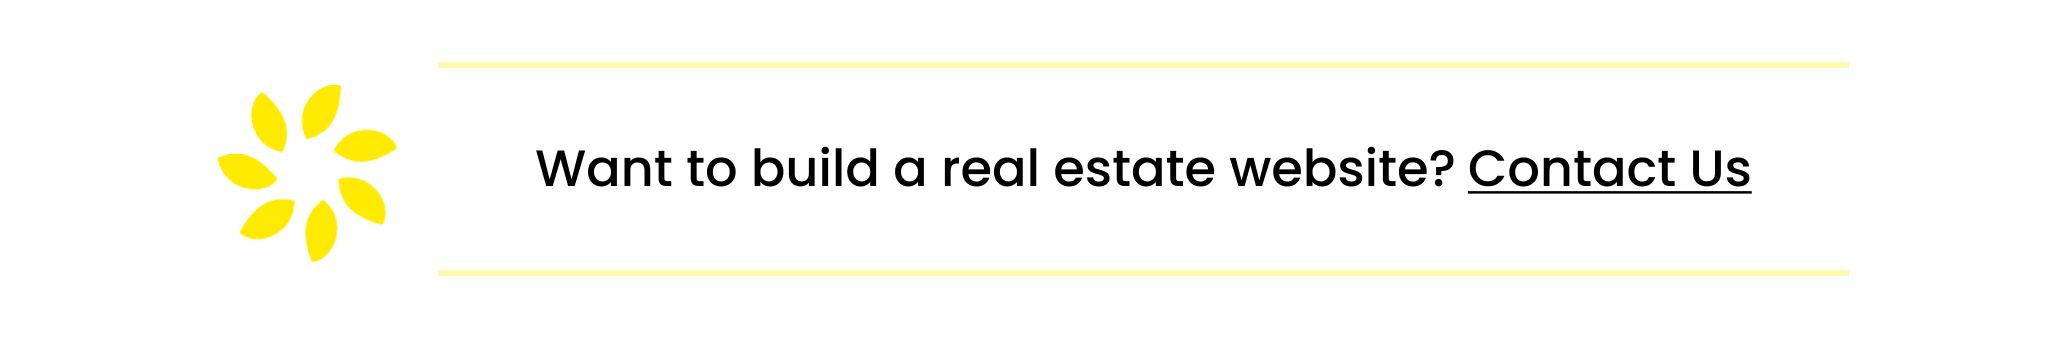 Build a real estate website